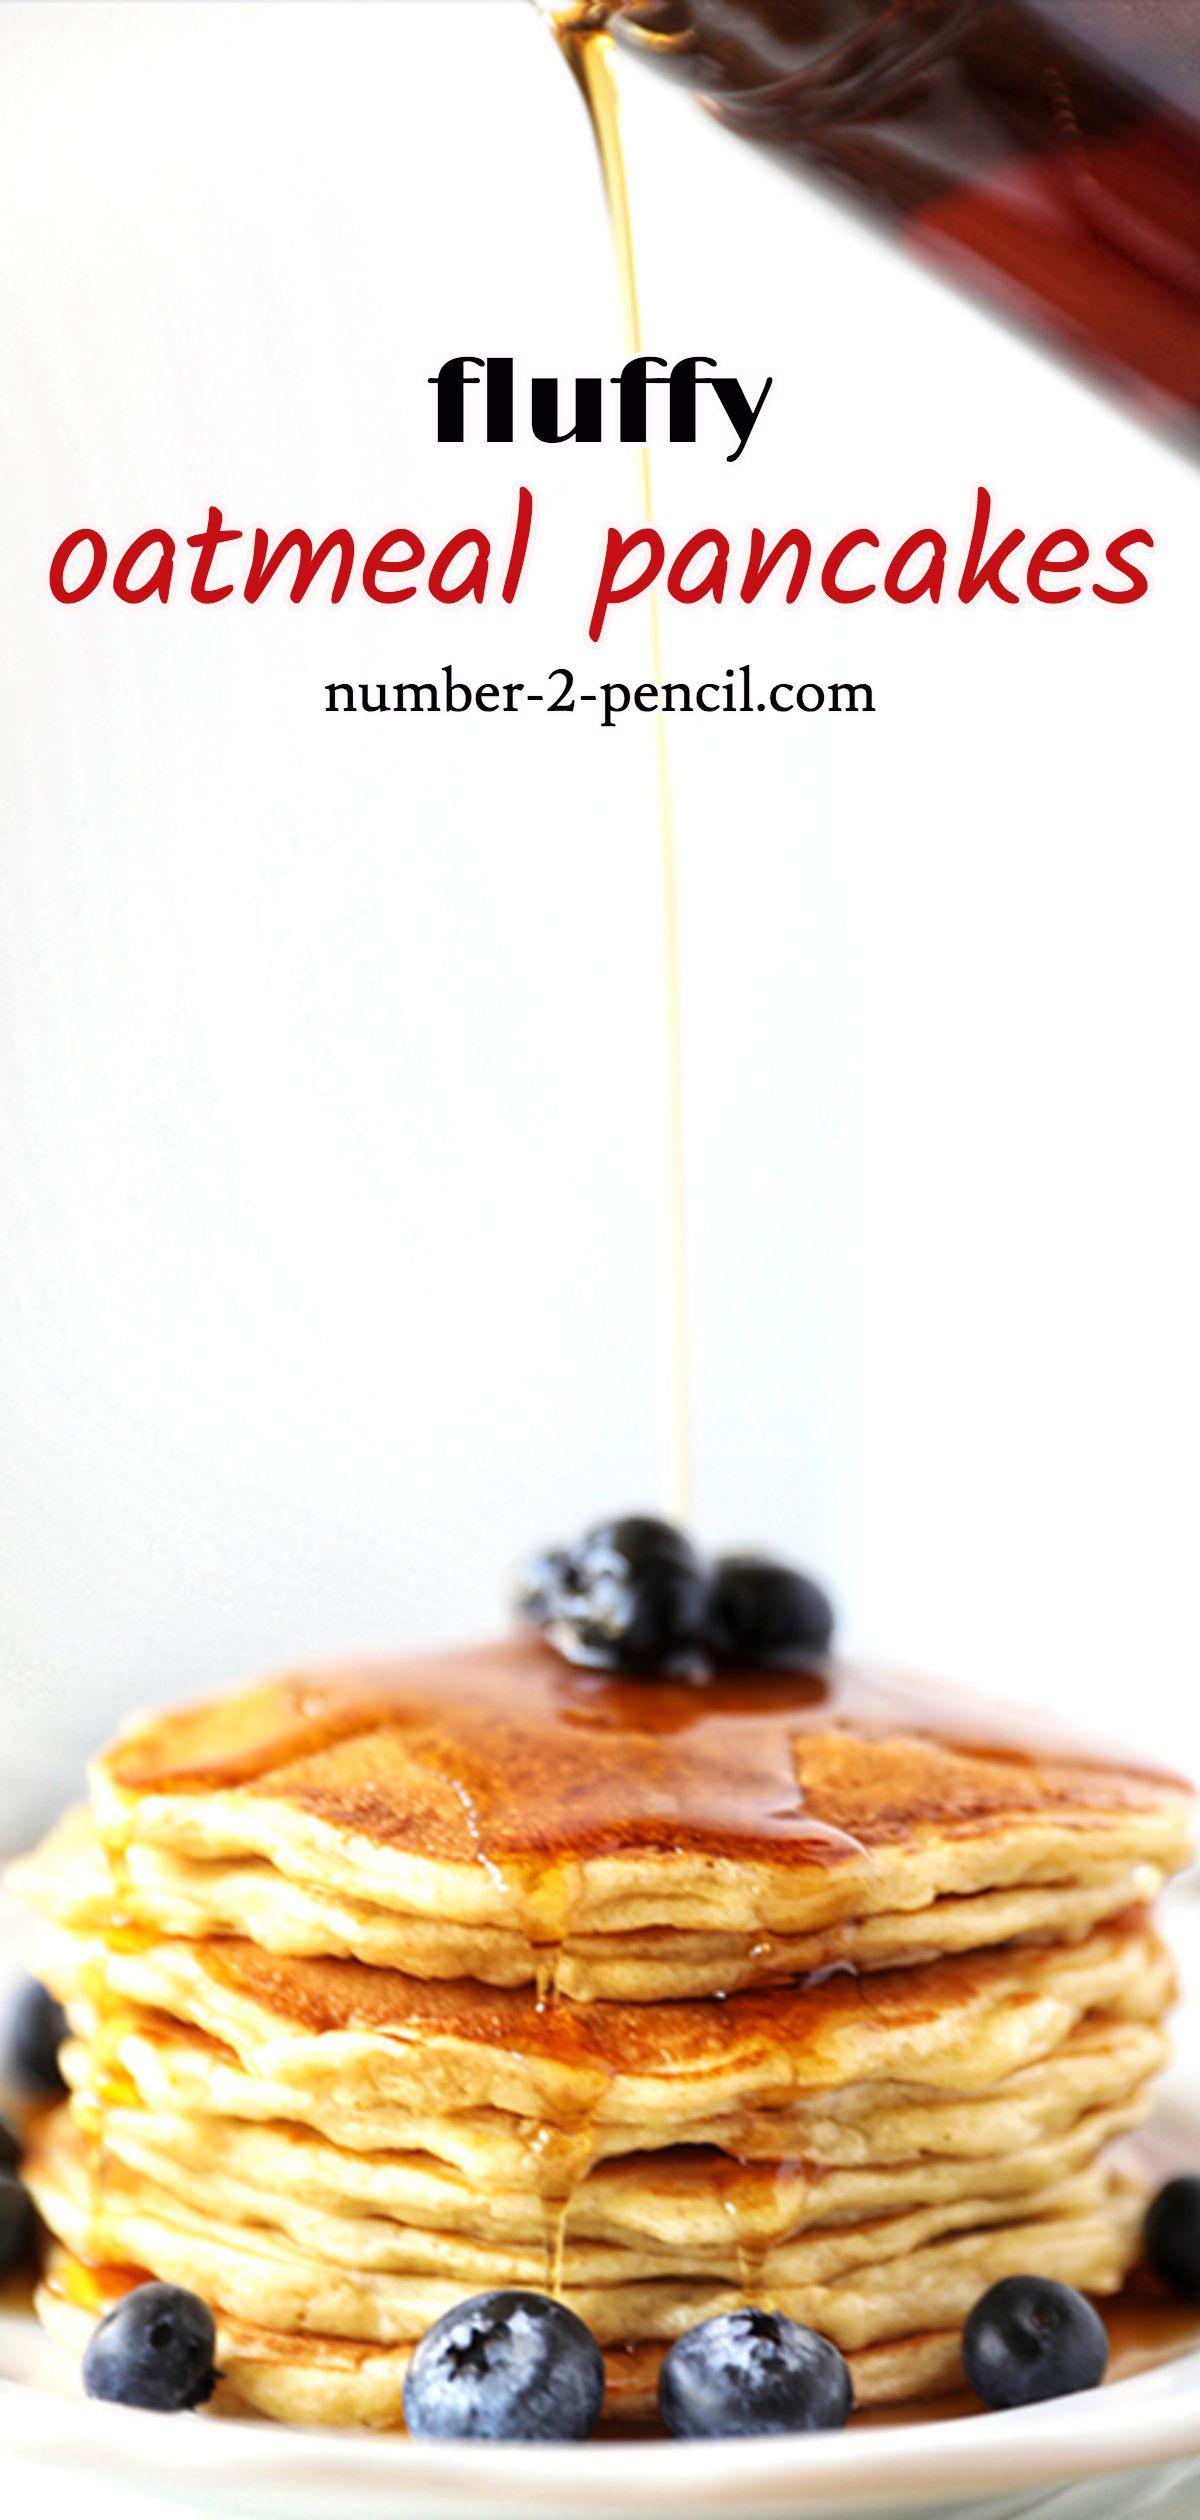 Oatmeal Pancakes Fluffy Oatmeal Pancake Recipe Recipe Oatmeal Pancakes Oatmeal Pancakes Recipe Pancake Recipe Buttermilk